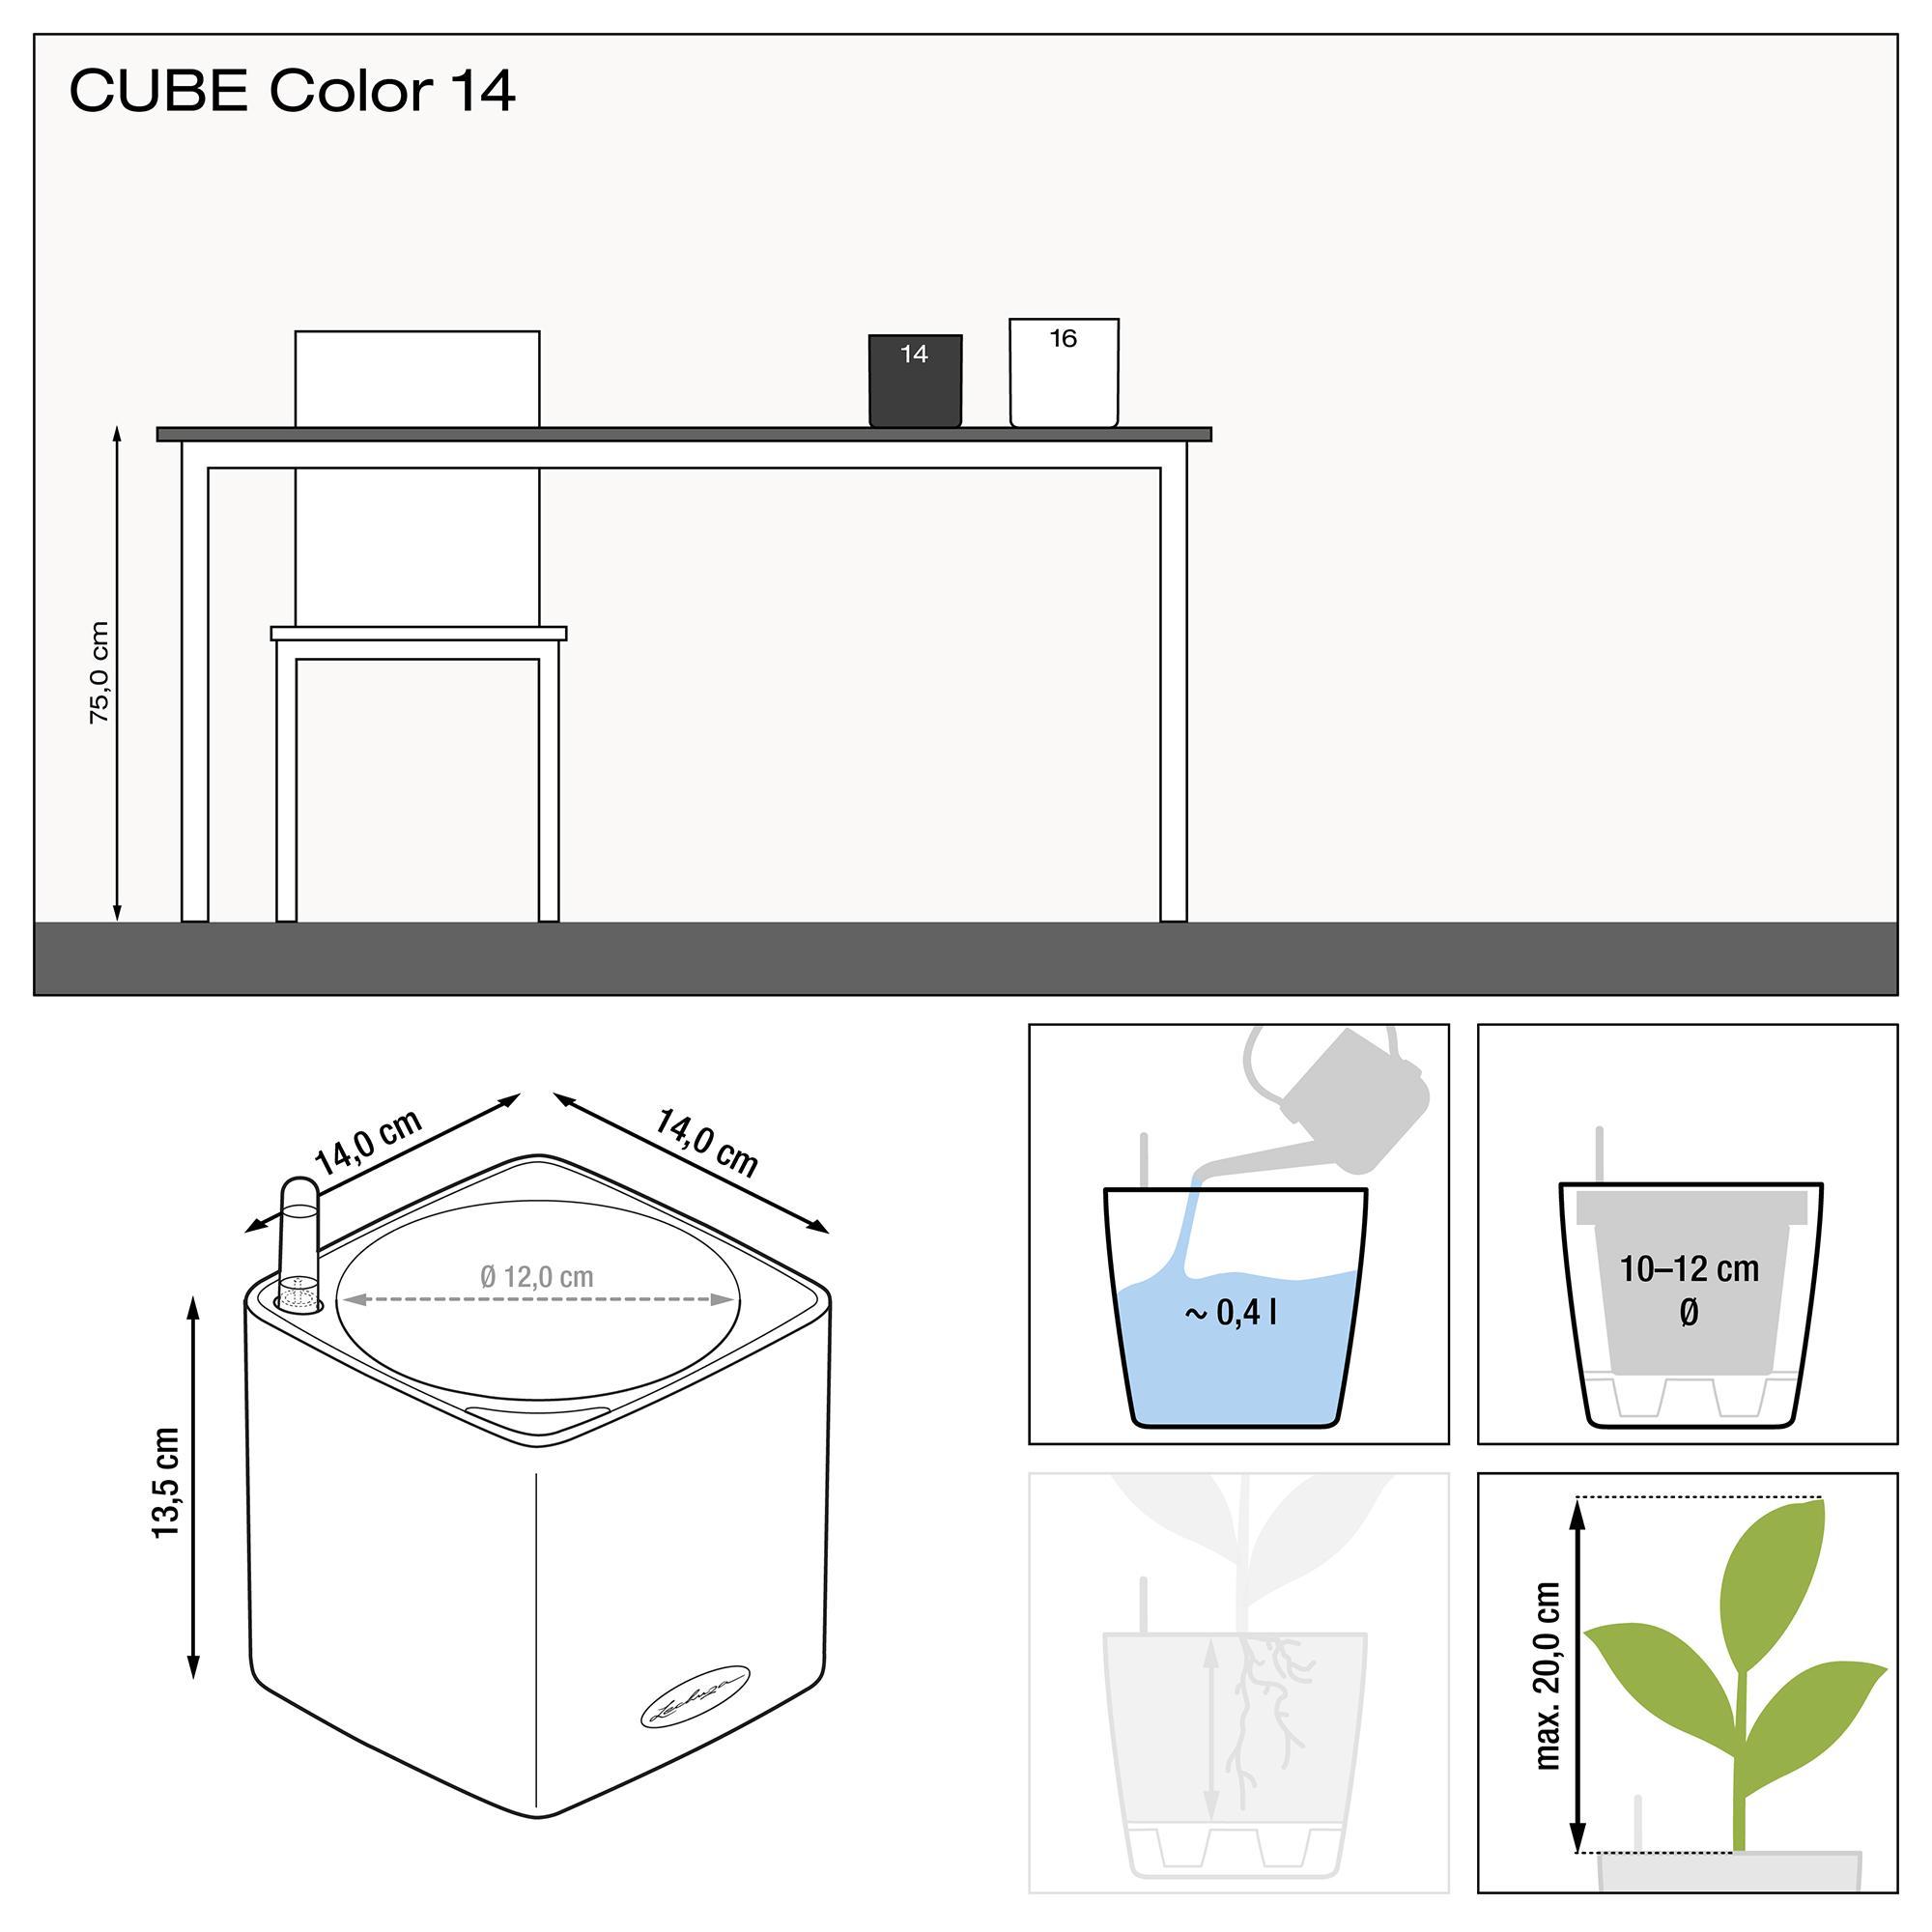 CUBE Color 14 aubergine - Image 2